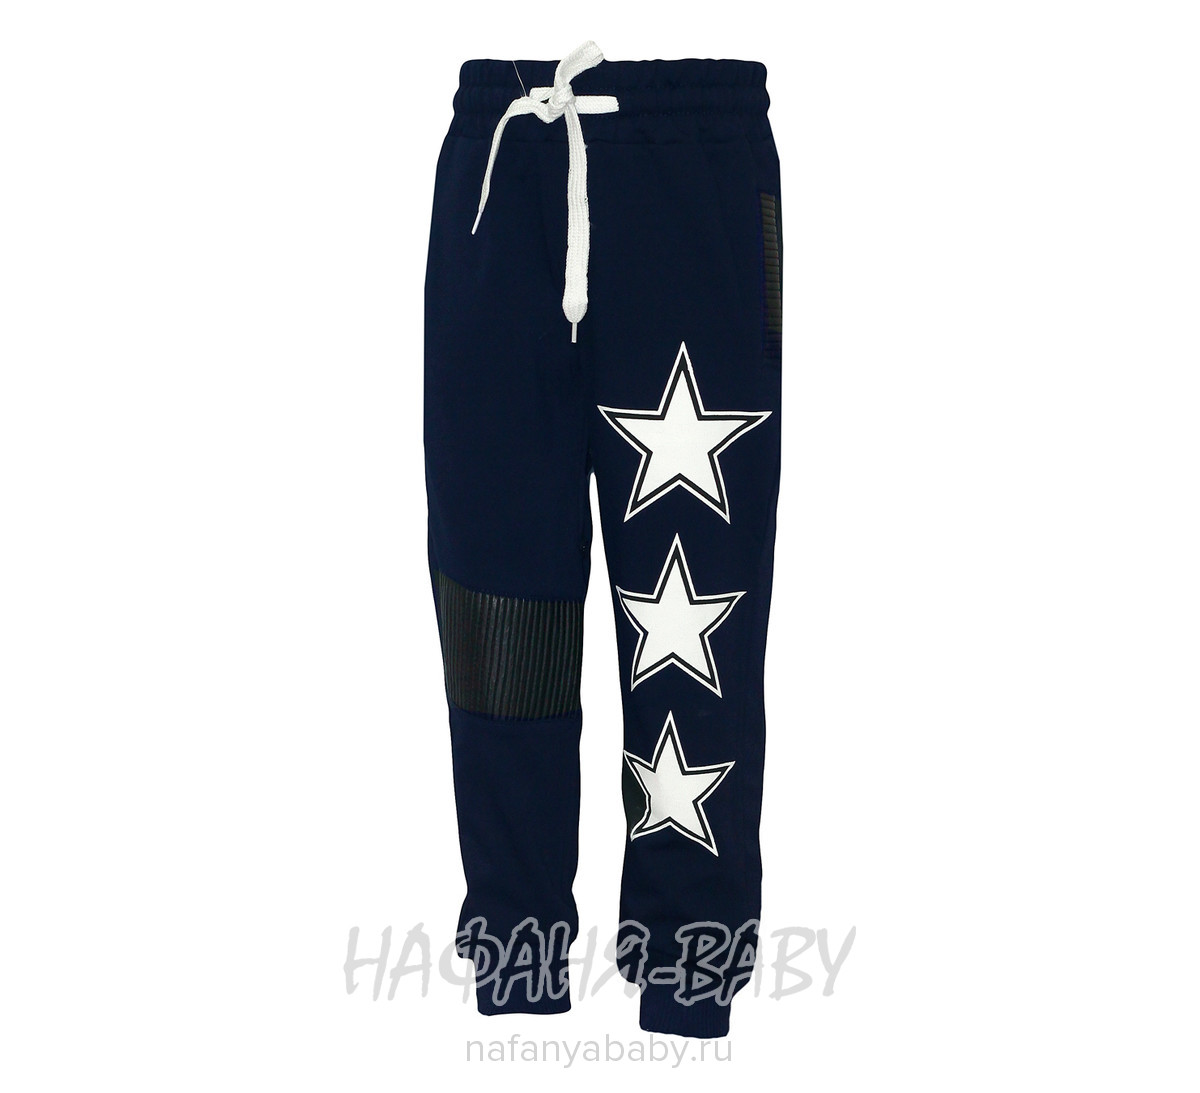 Детские брюки, артикул 2028 13-16 TNTS SPORTS арт: 2028, цвет серый меланж, оптом Турция